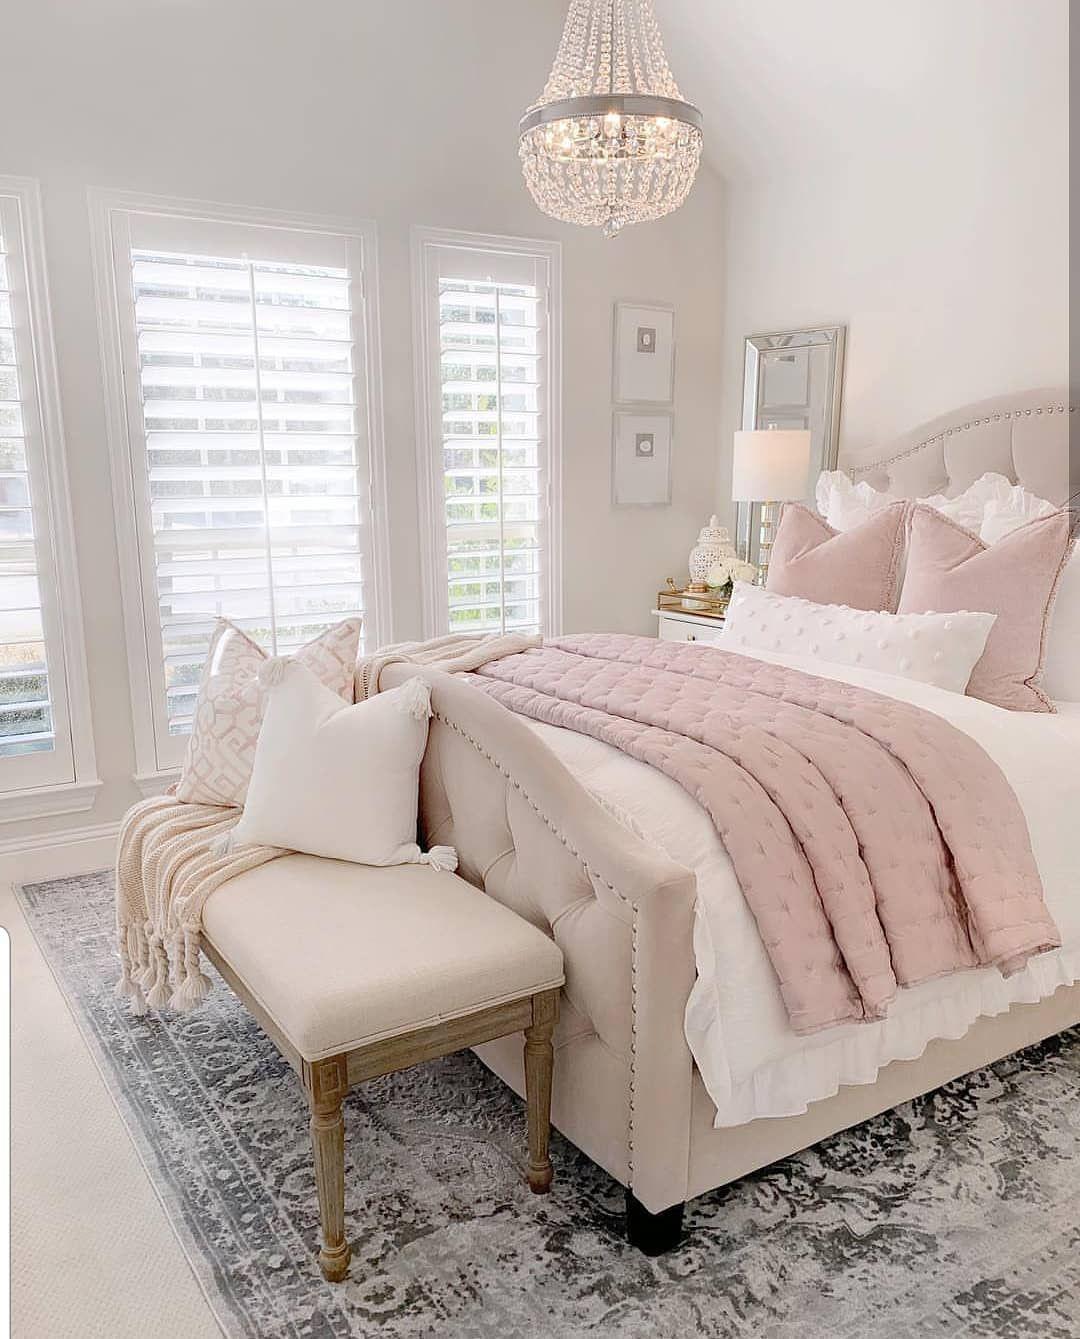 "Home Decor/Interior Design On Instagram: ""Sweet Dreams IG"